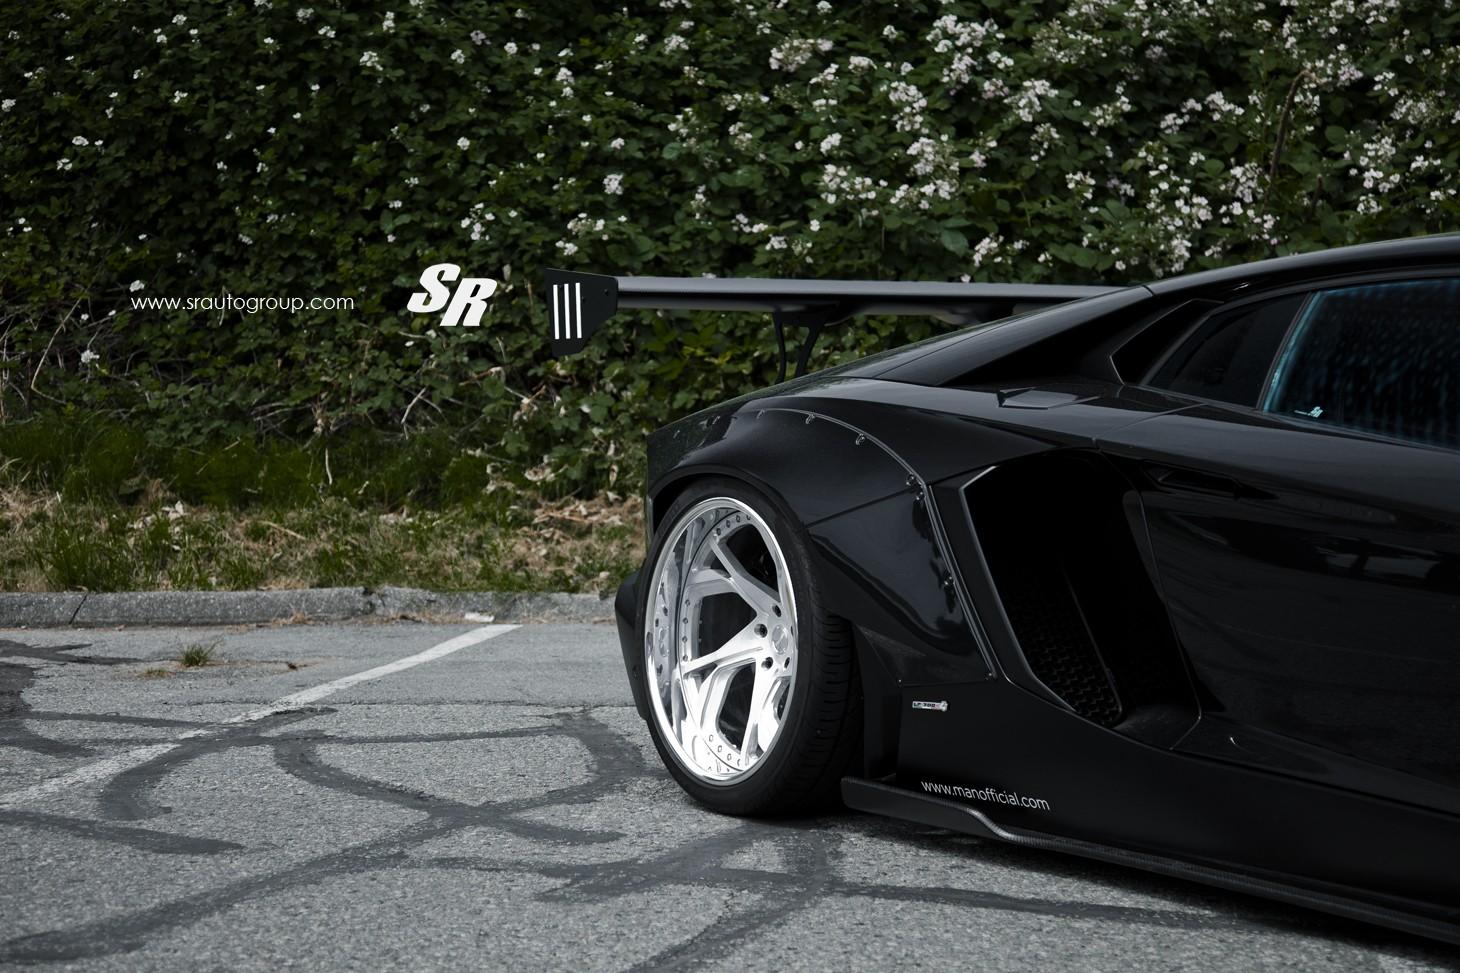 Stanced Lamborghini Aventador With Liberty Walk Kit Looks